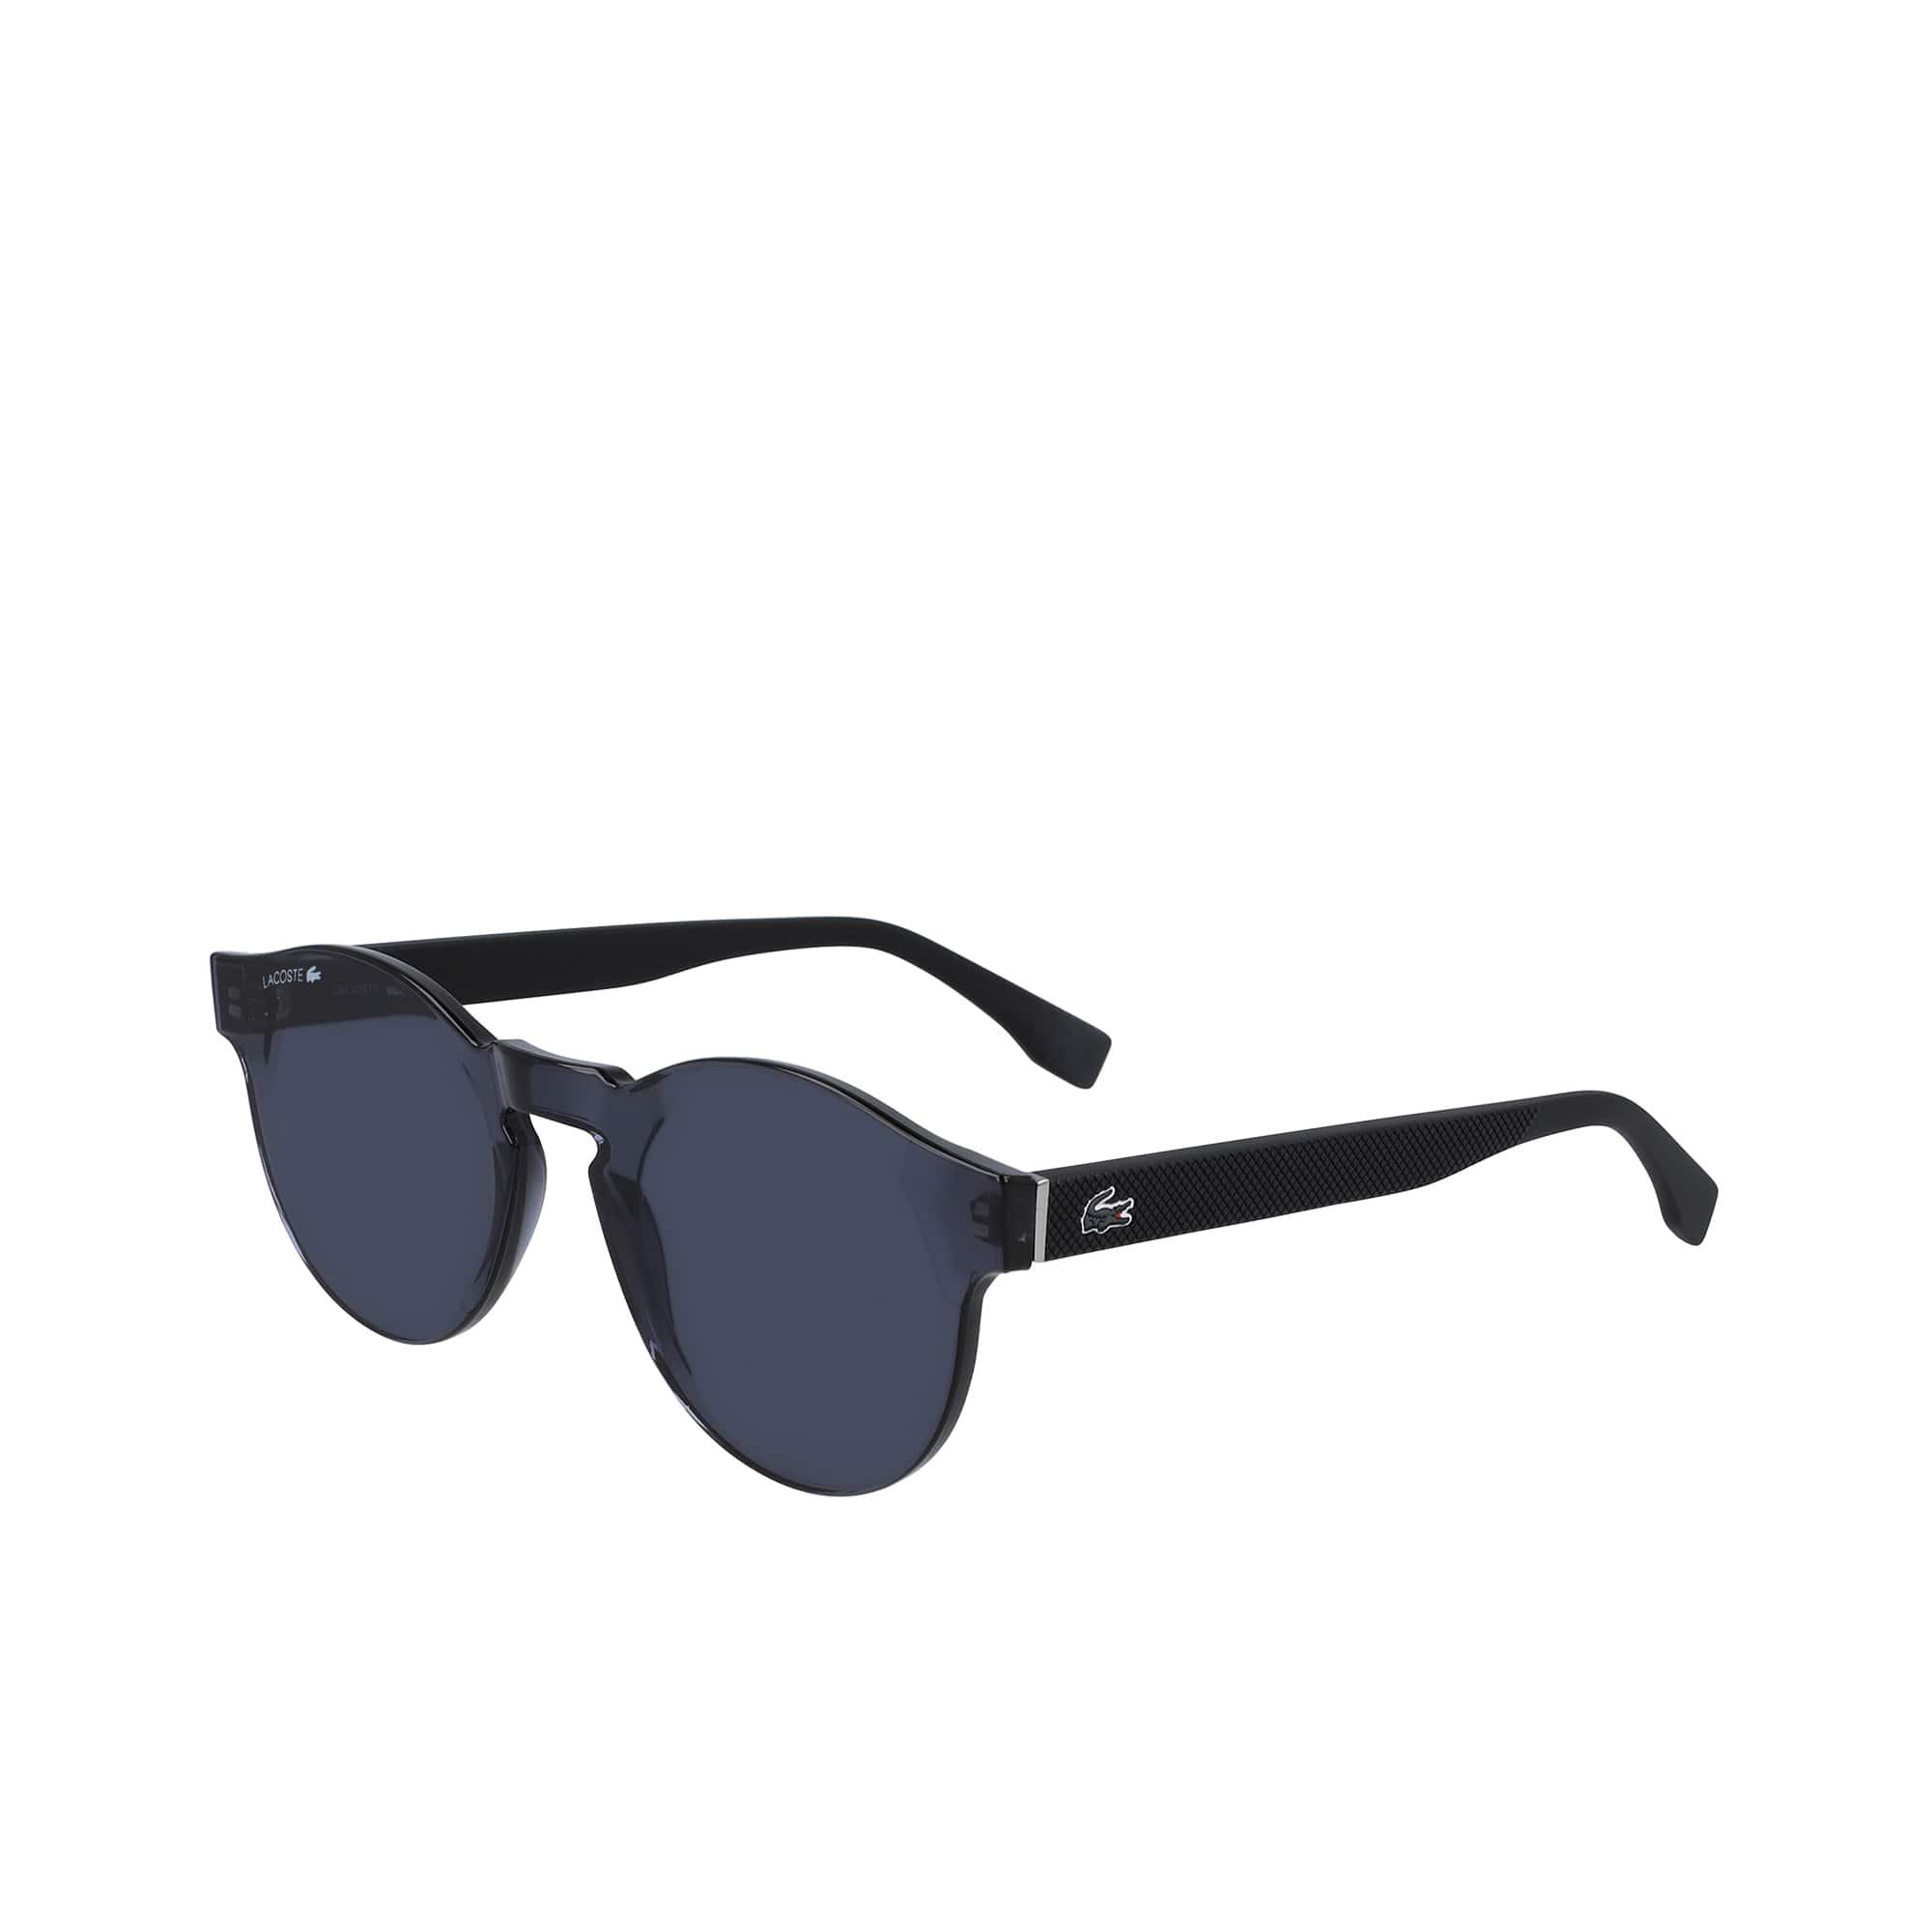 7cd0fce753 Shield L.12.12 One Lens Sunglasses